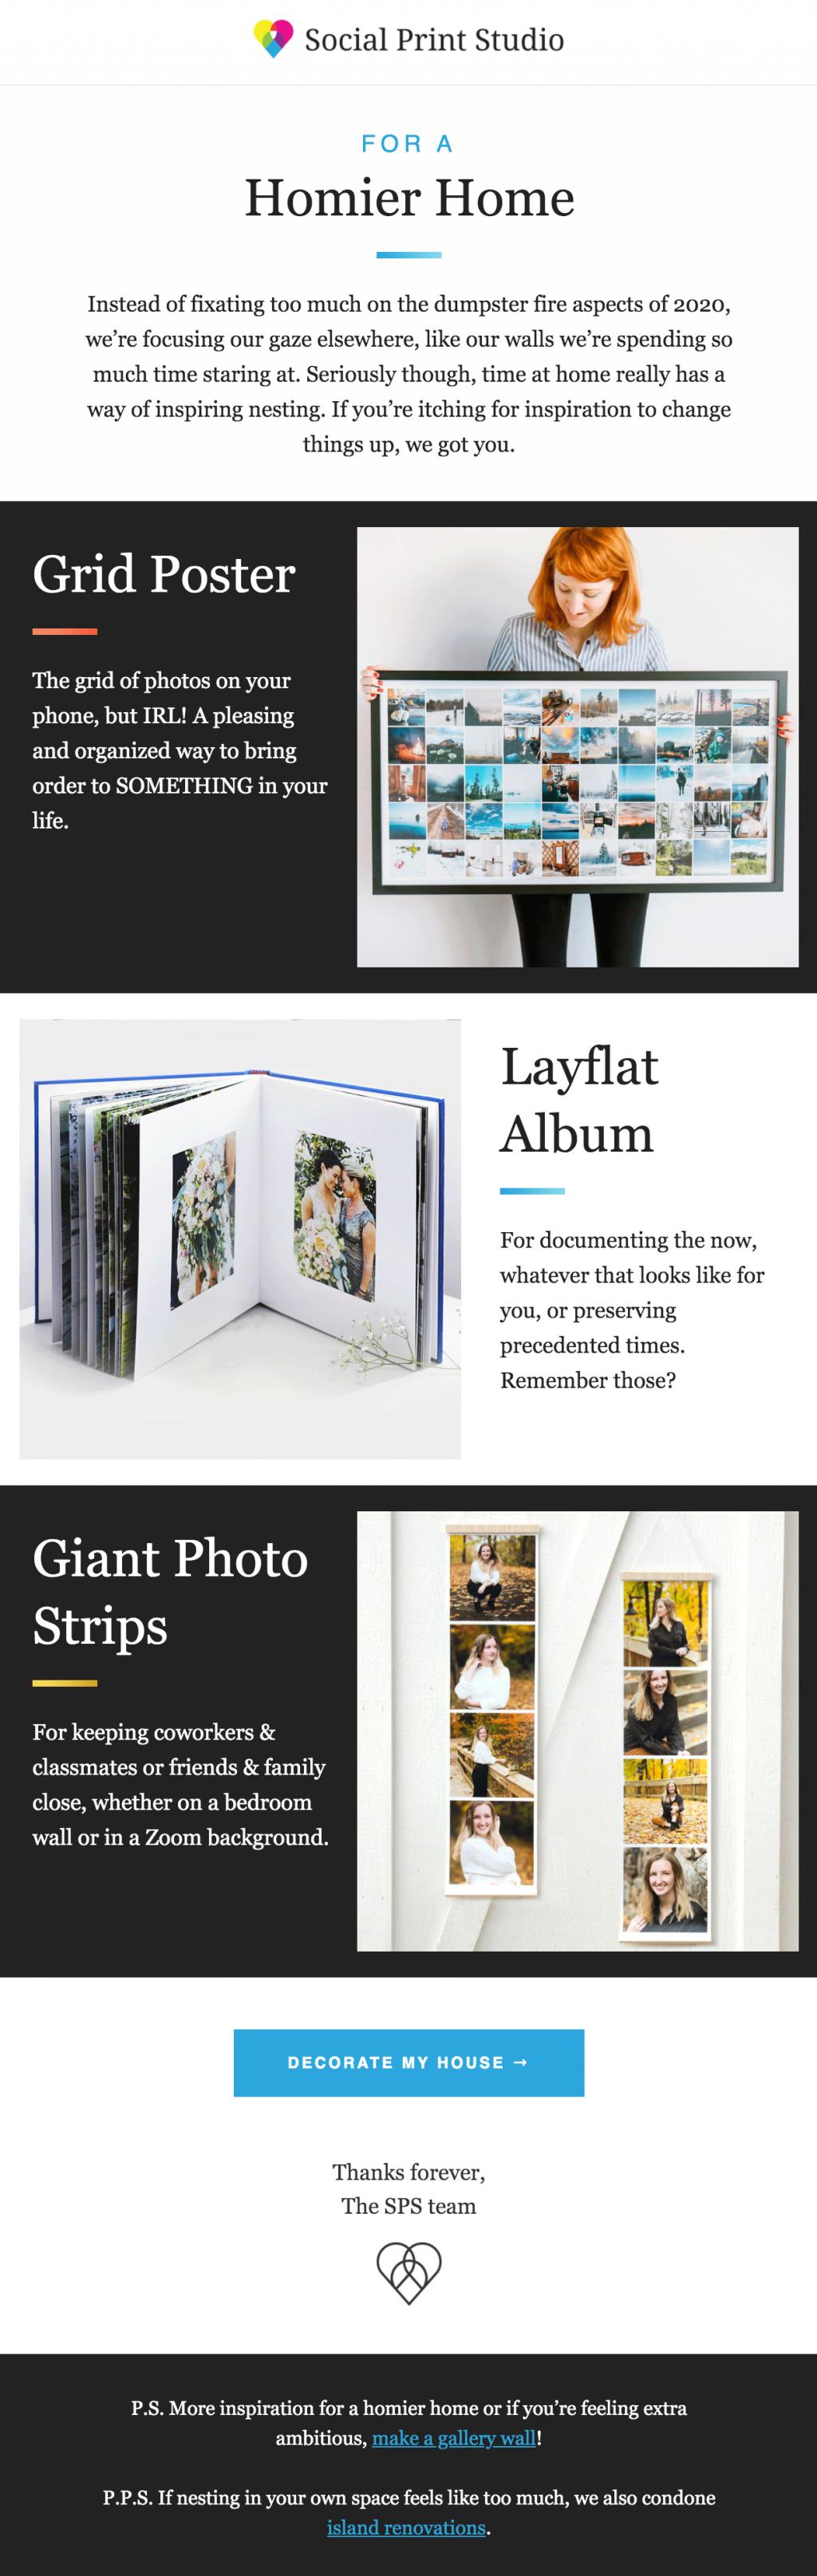 Screenshot of best business email example, Social Print Studio